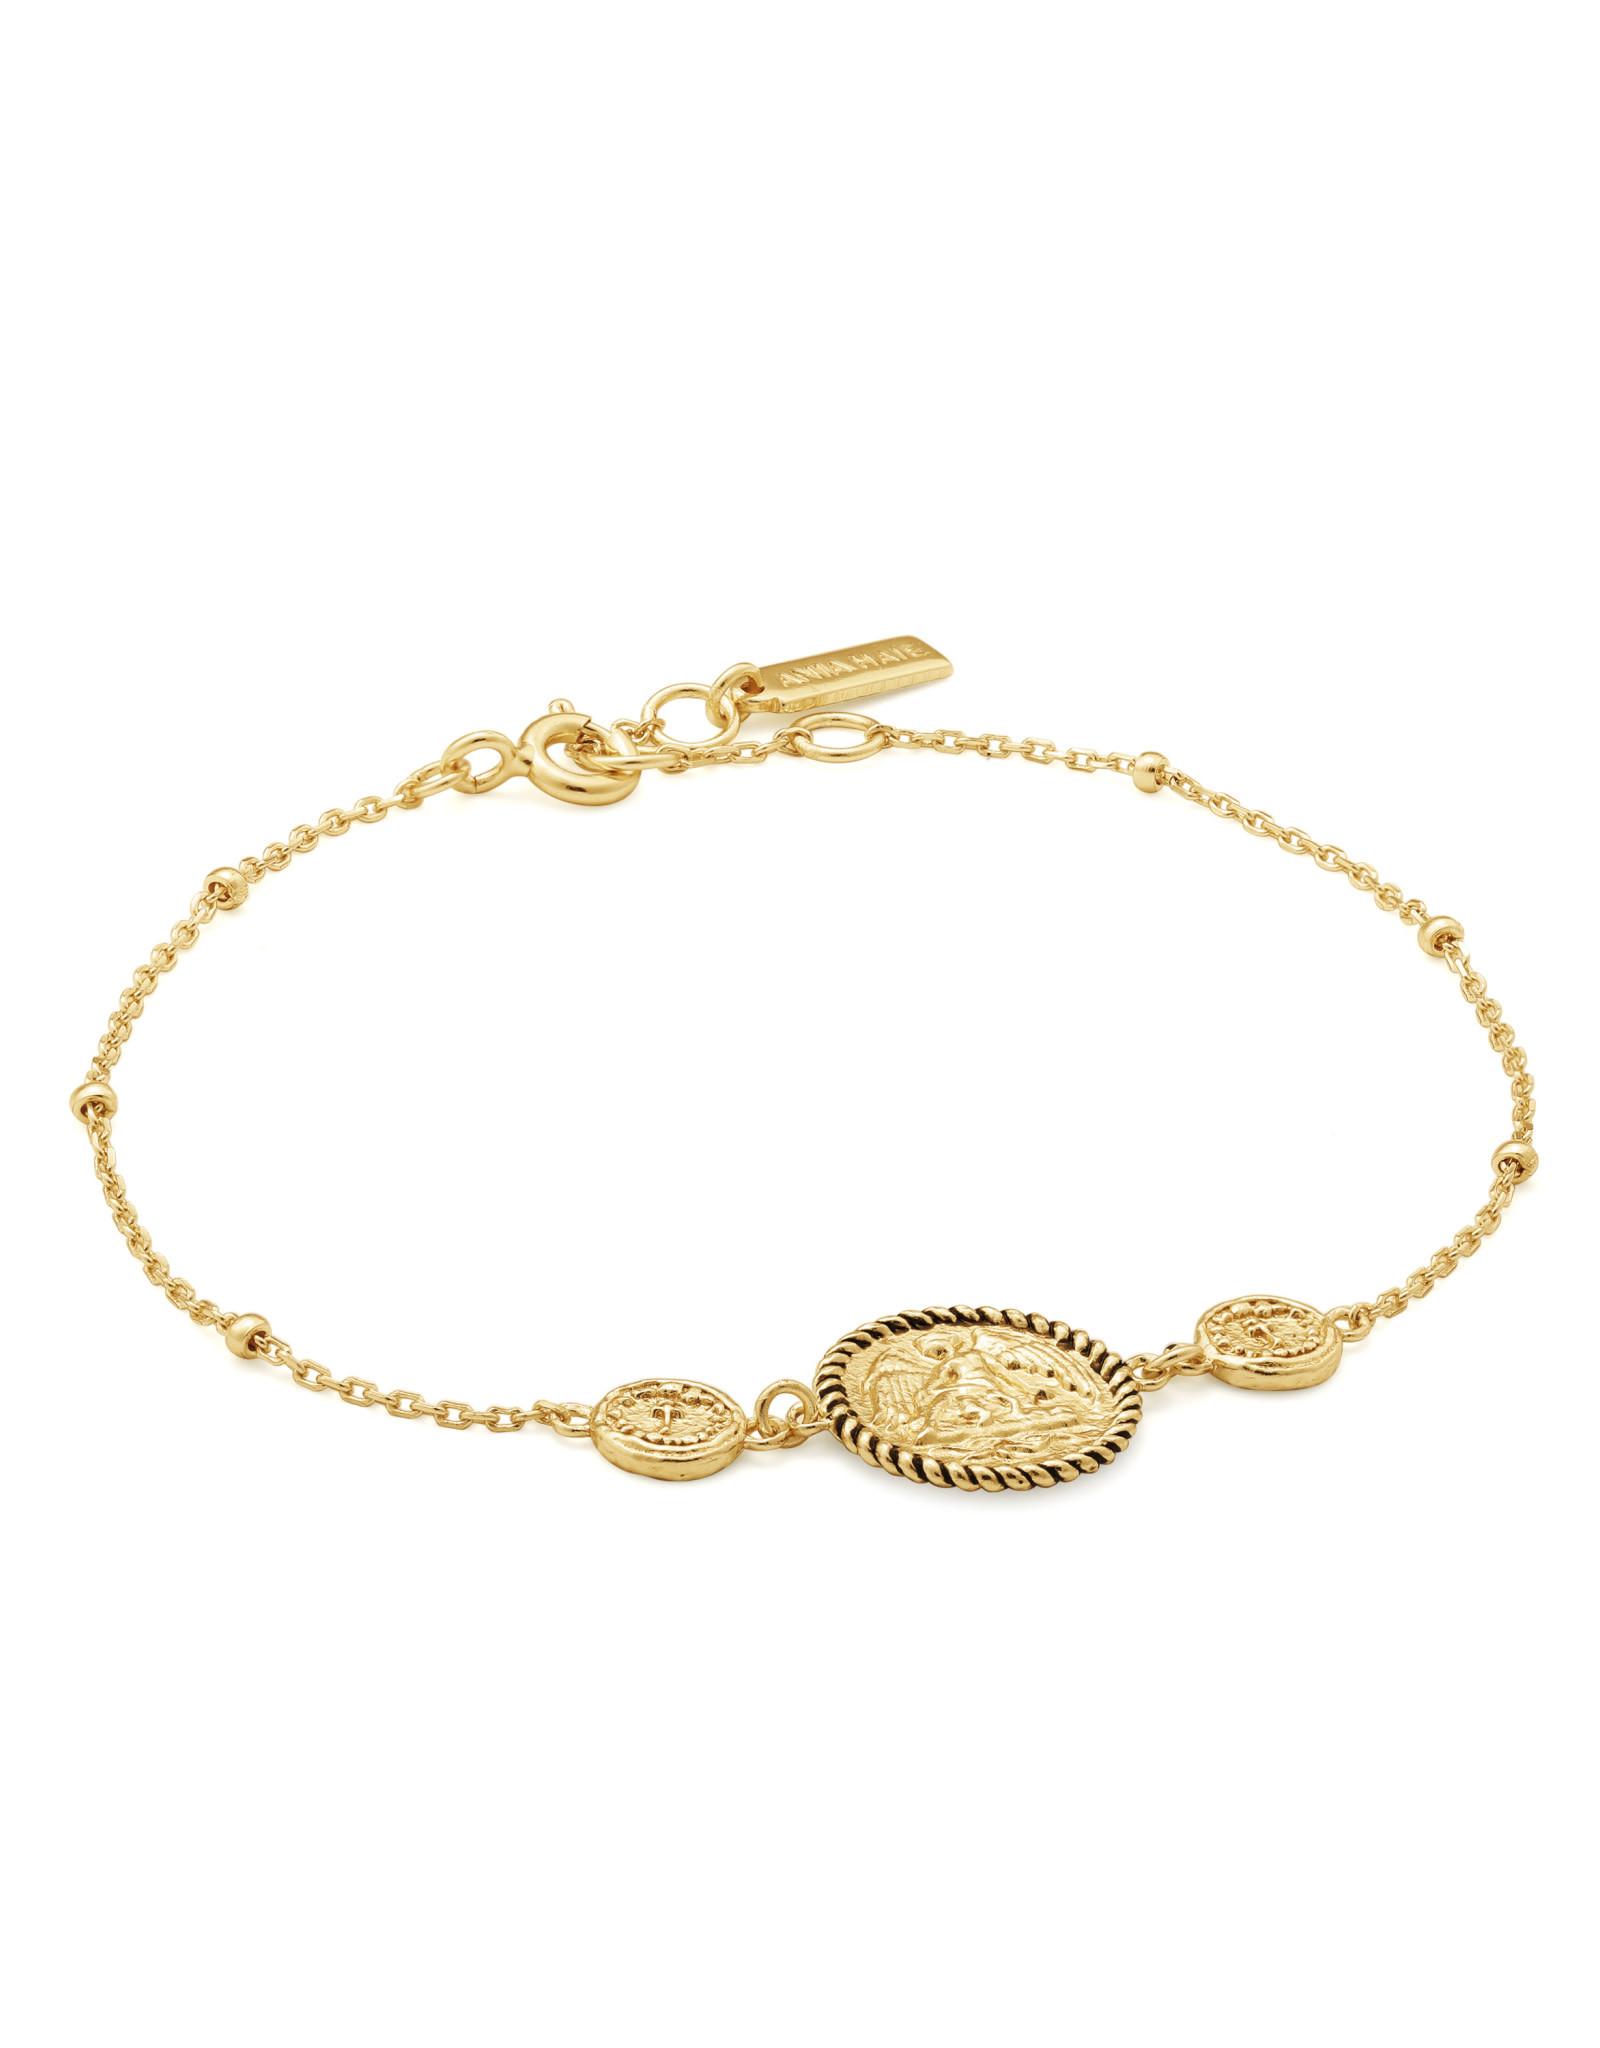 Ania Haie Ania haie - Winged goddess bracelet